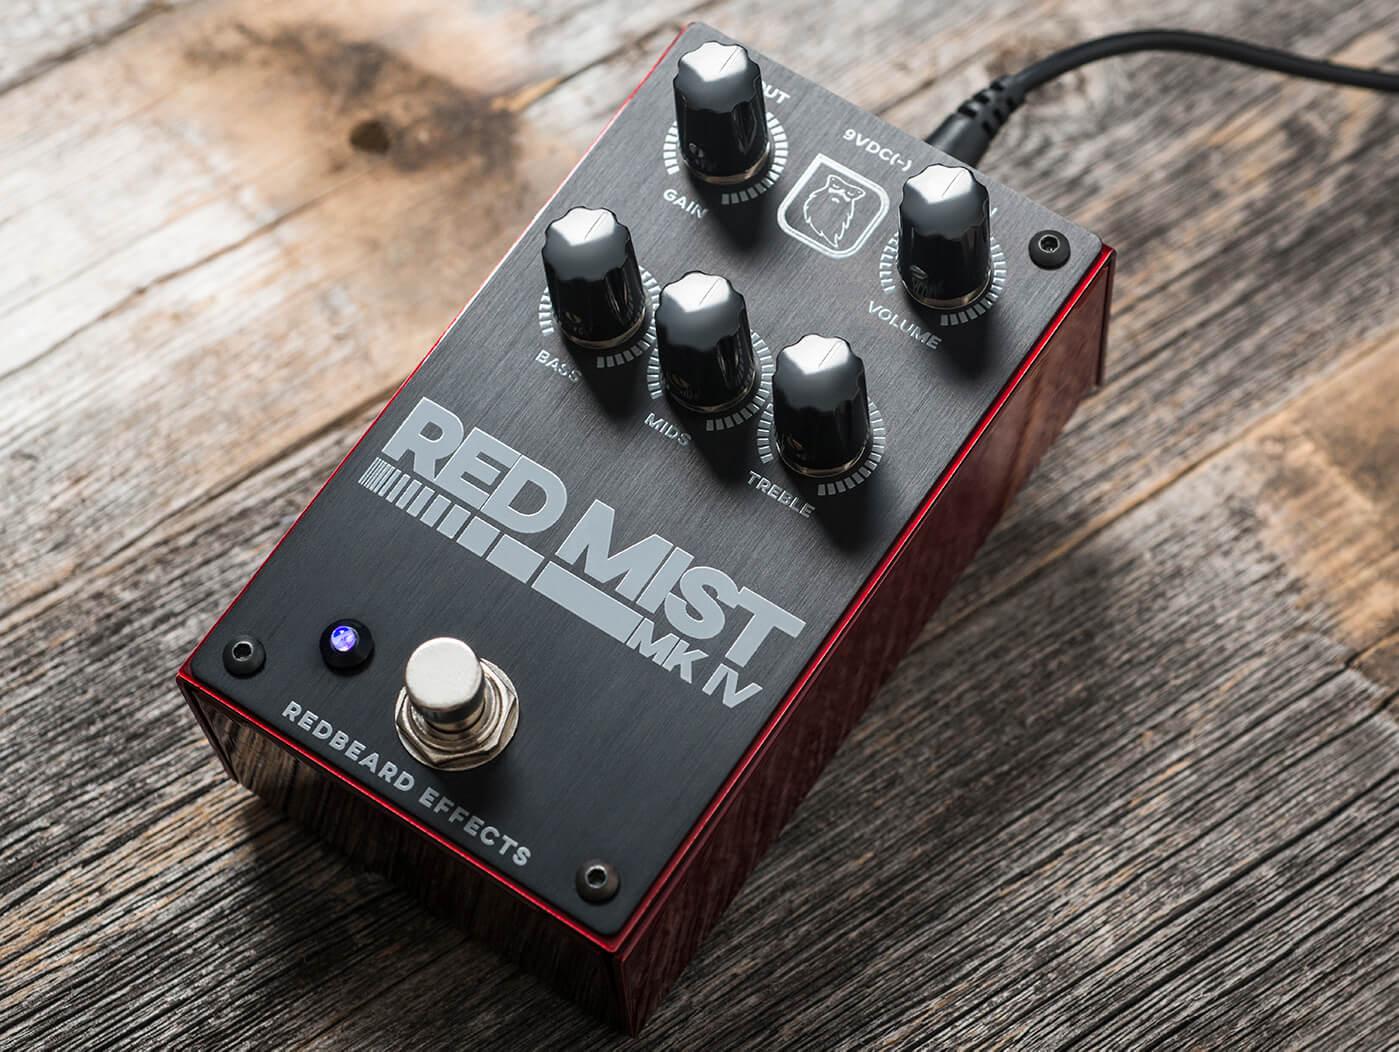 redbeard red mist mk iv